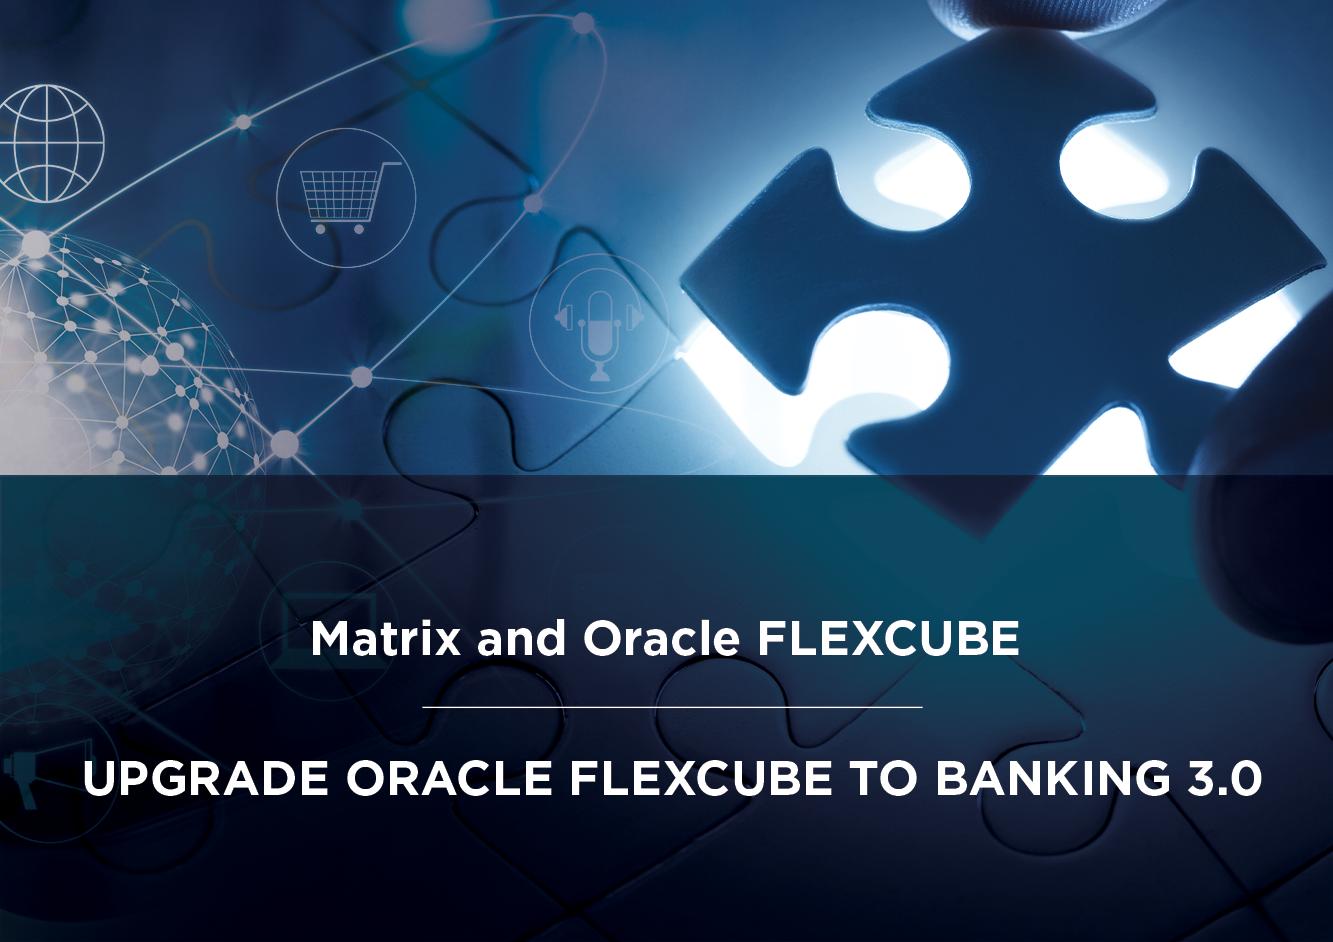 Upgrade Oracle Flexcube with Matrix